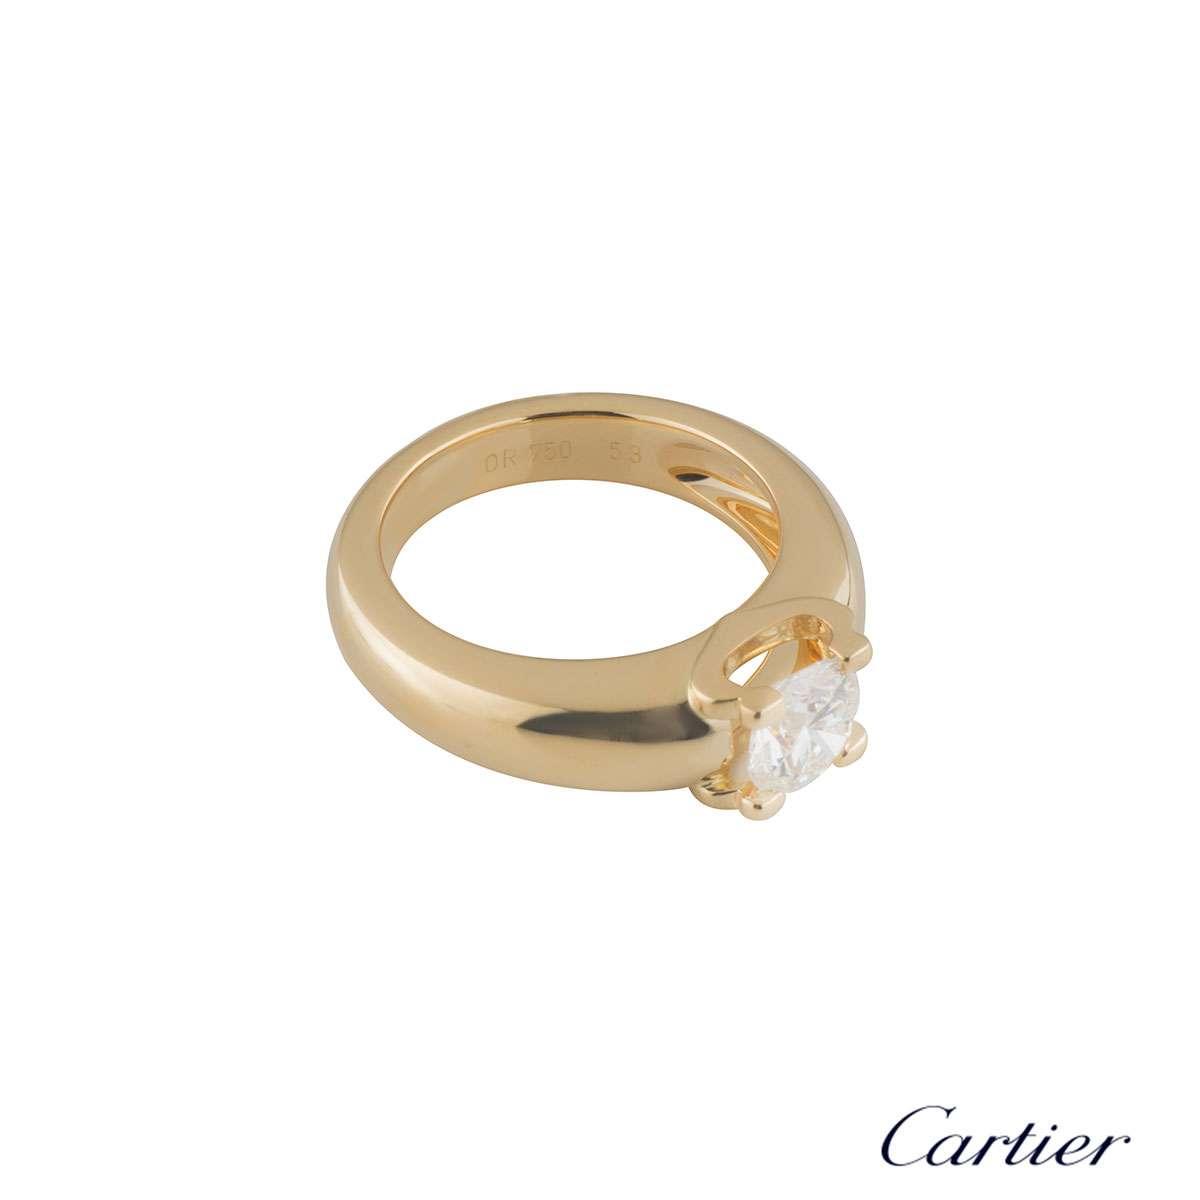 Yellow Gold C De Cartier Diamond Engagement Ring 1.01ct G/VVS2